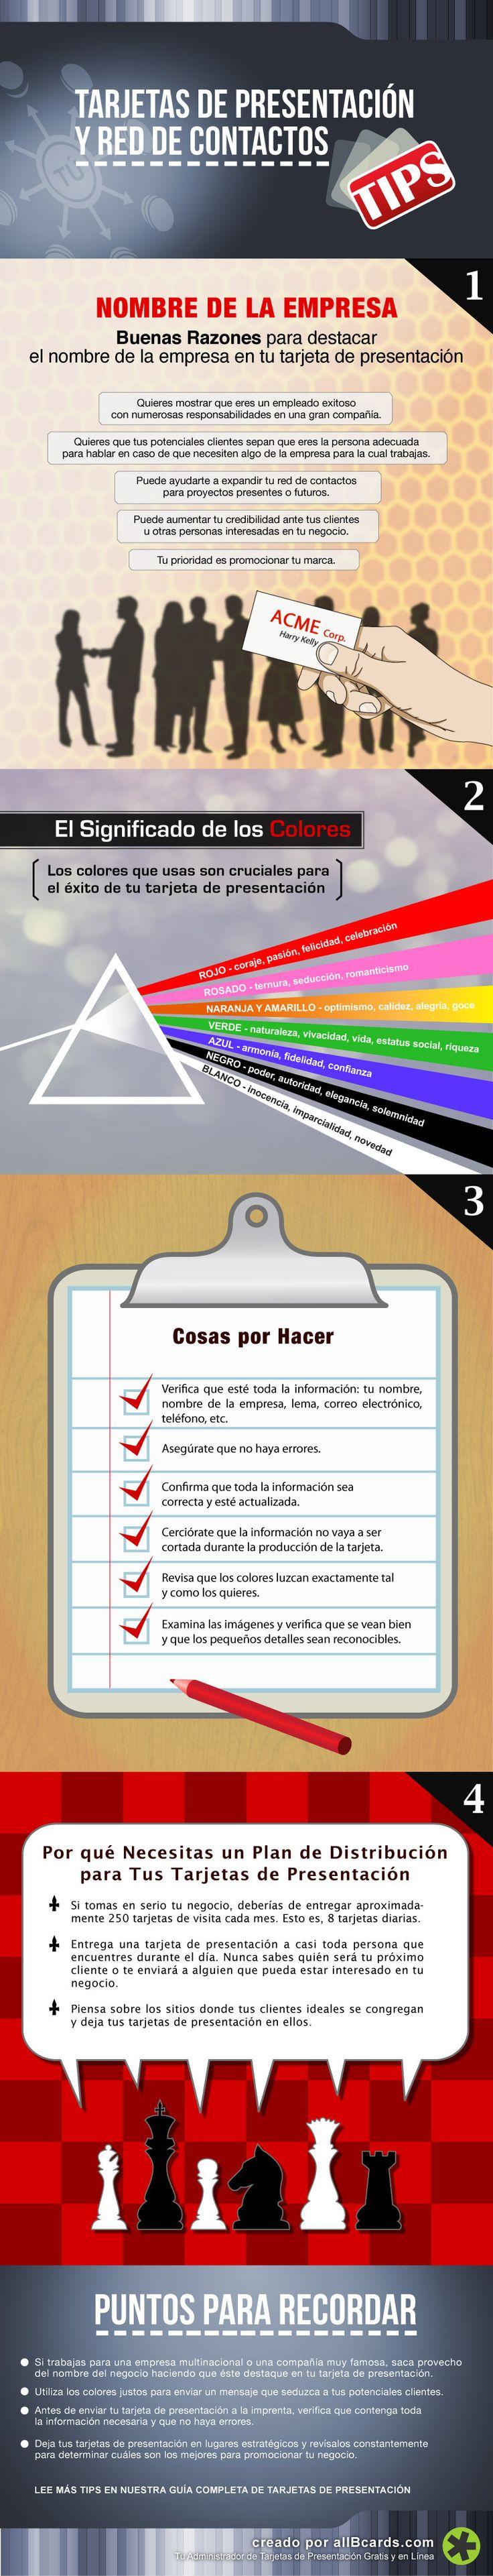 Consejos para tus tarjetas de visita #infografia #infographic #marketing